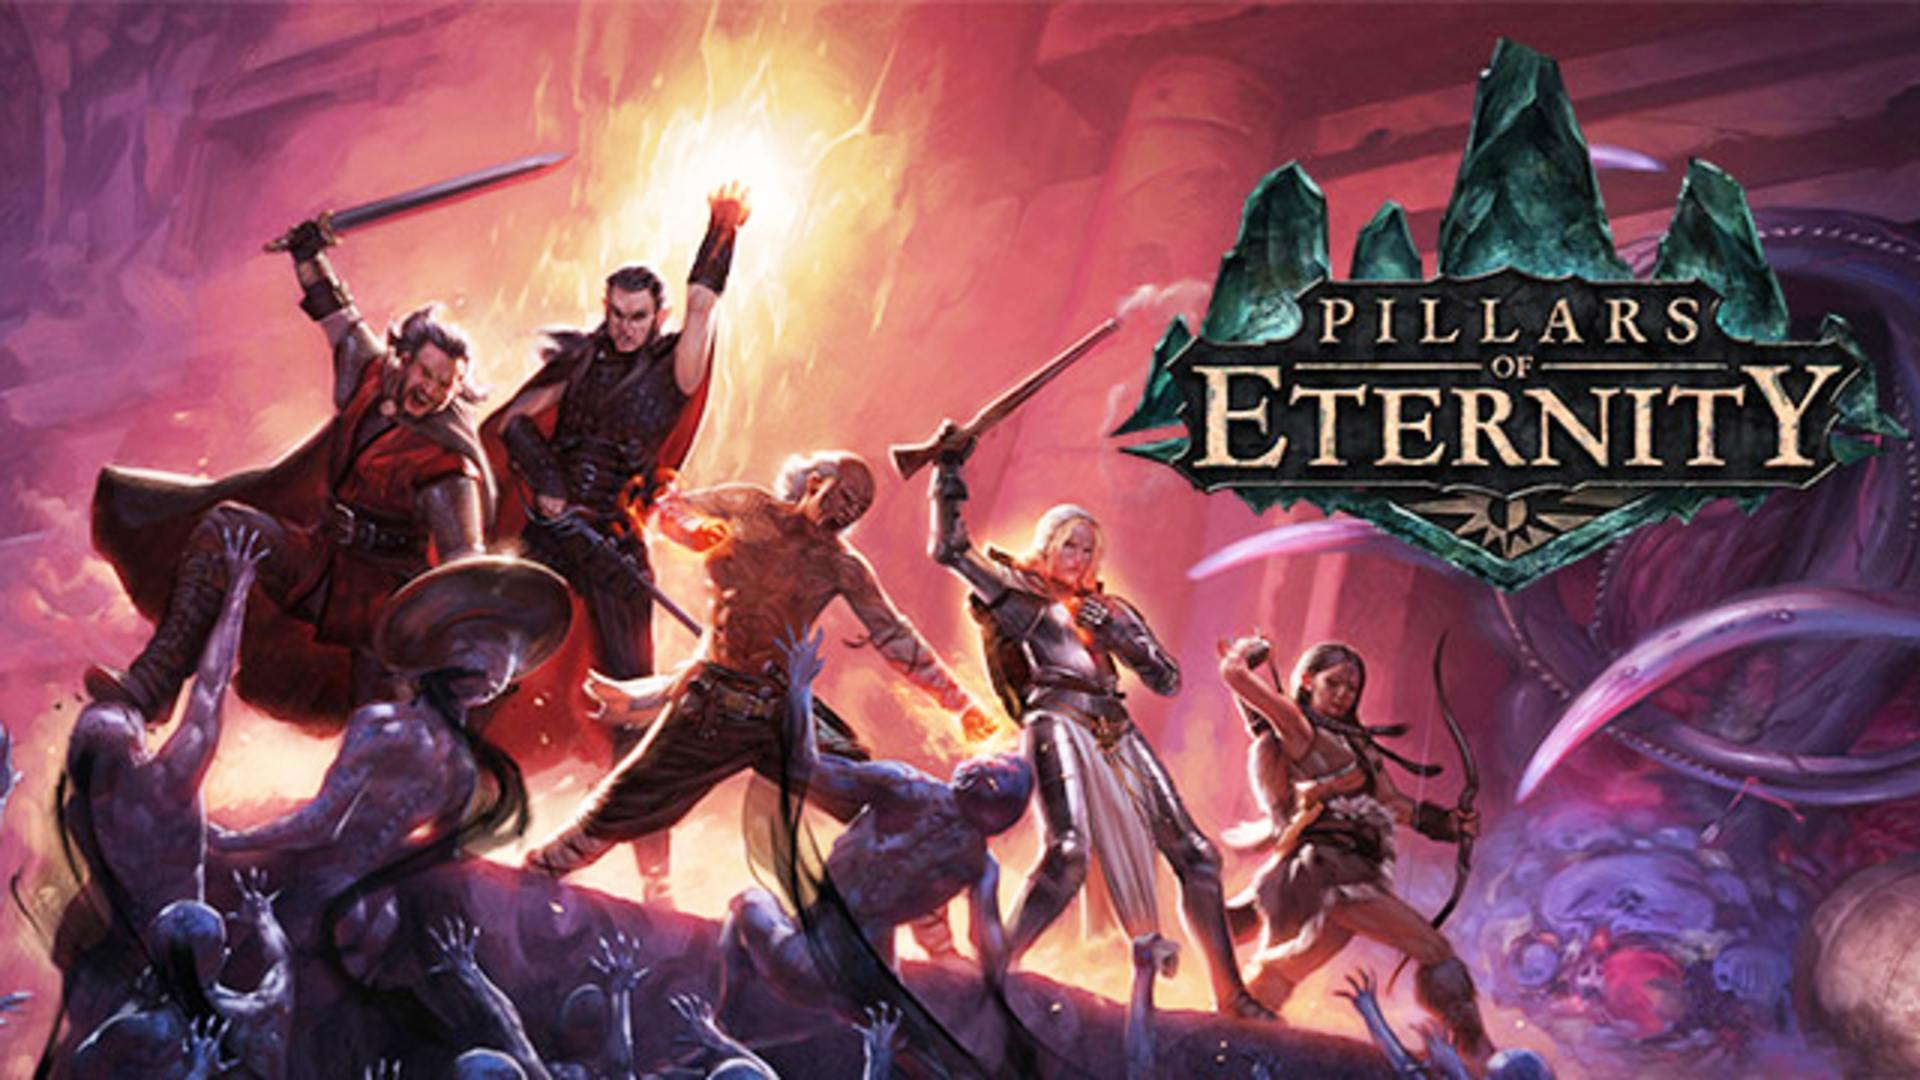 Pillars of Eternity - Hero Edition | Linux Mac PC Steam Game